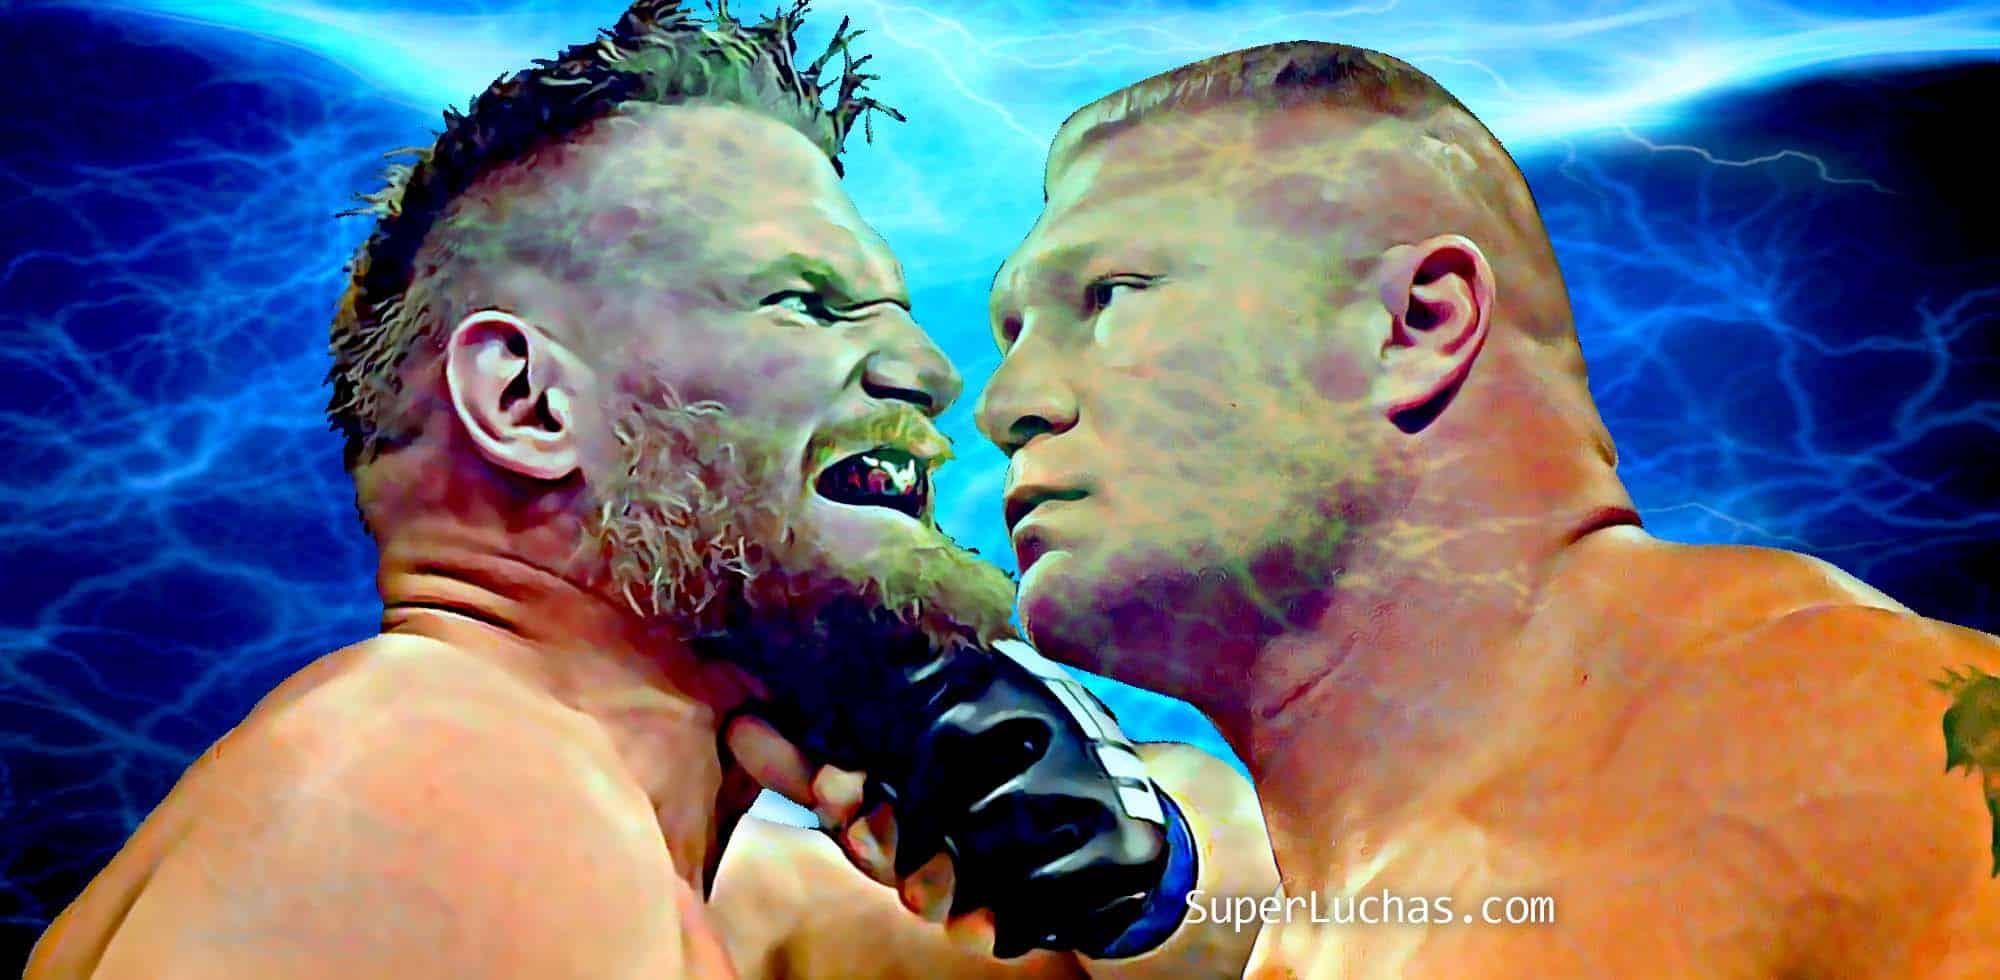 Josh Barnett vs. Brock Lesnar